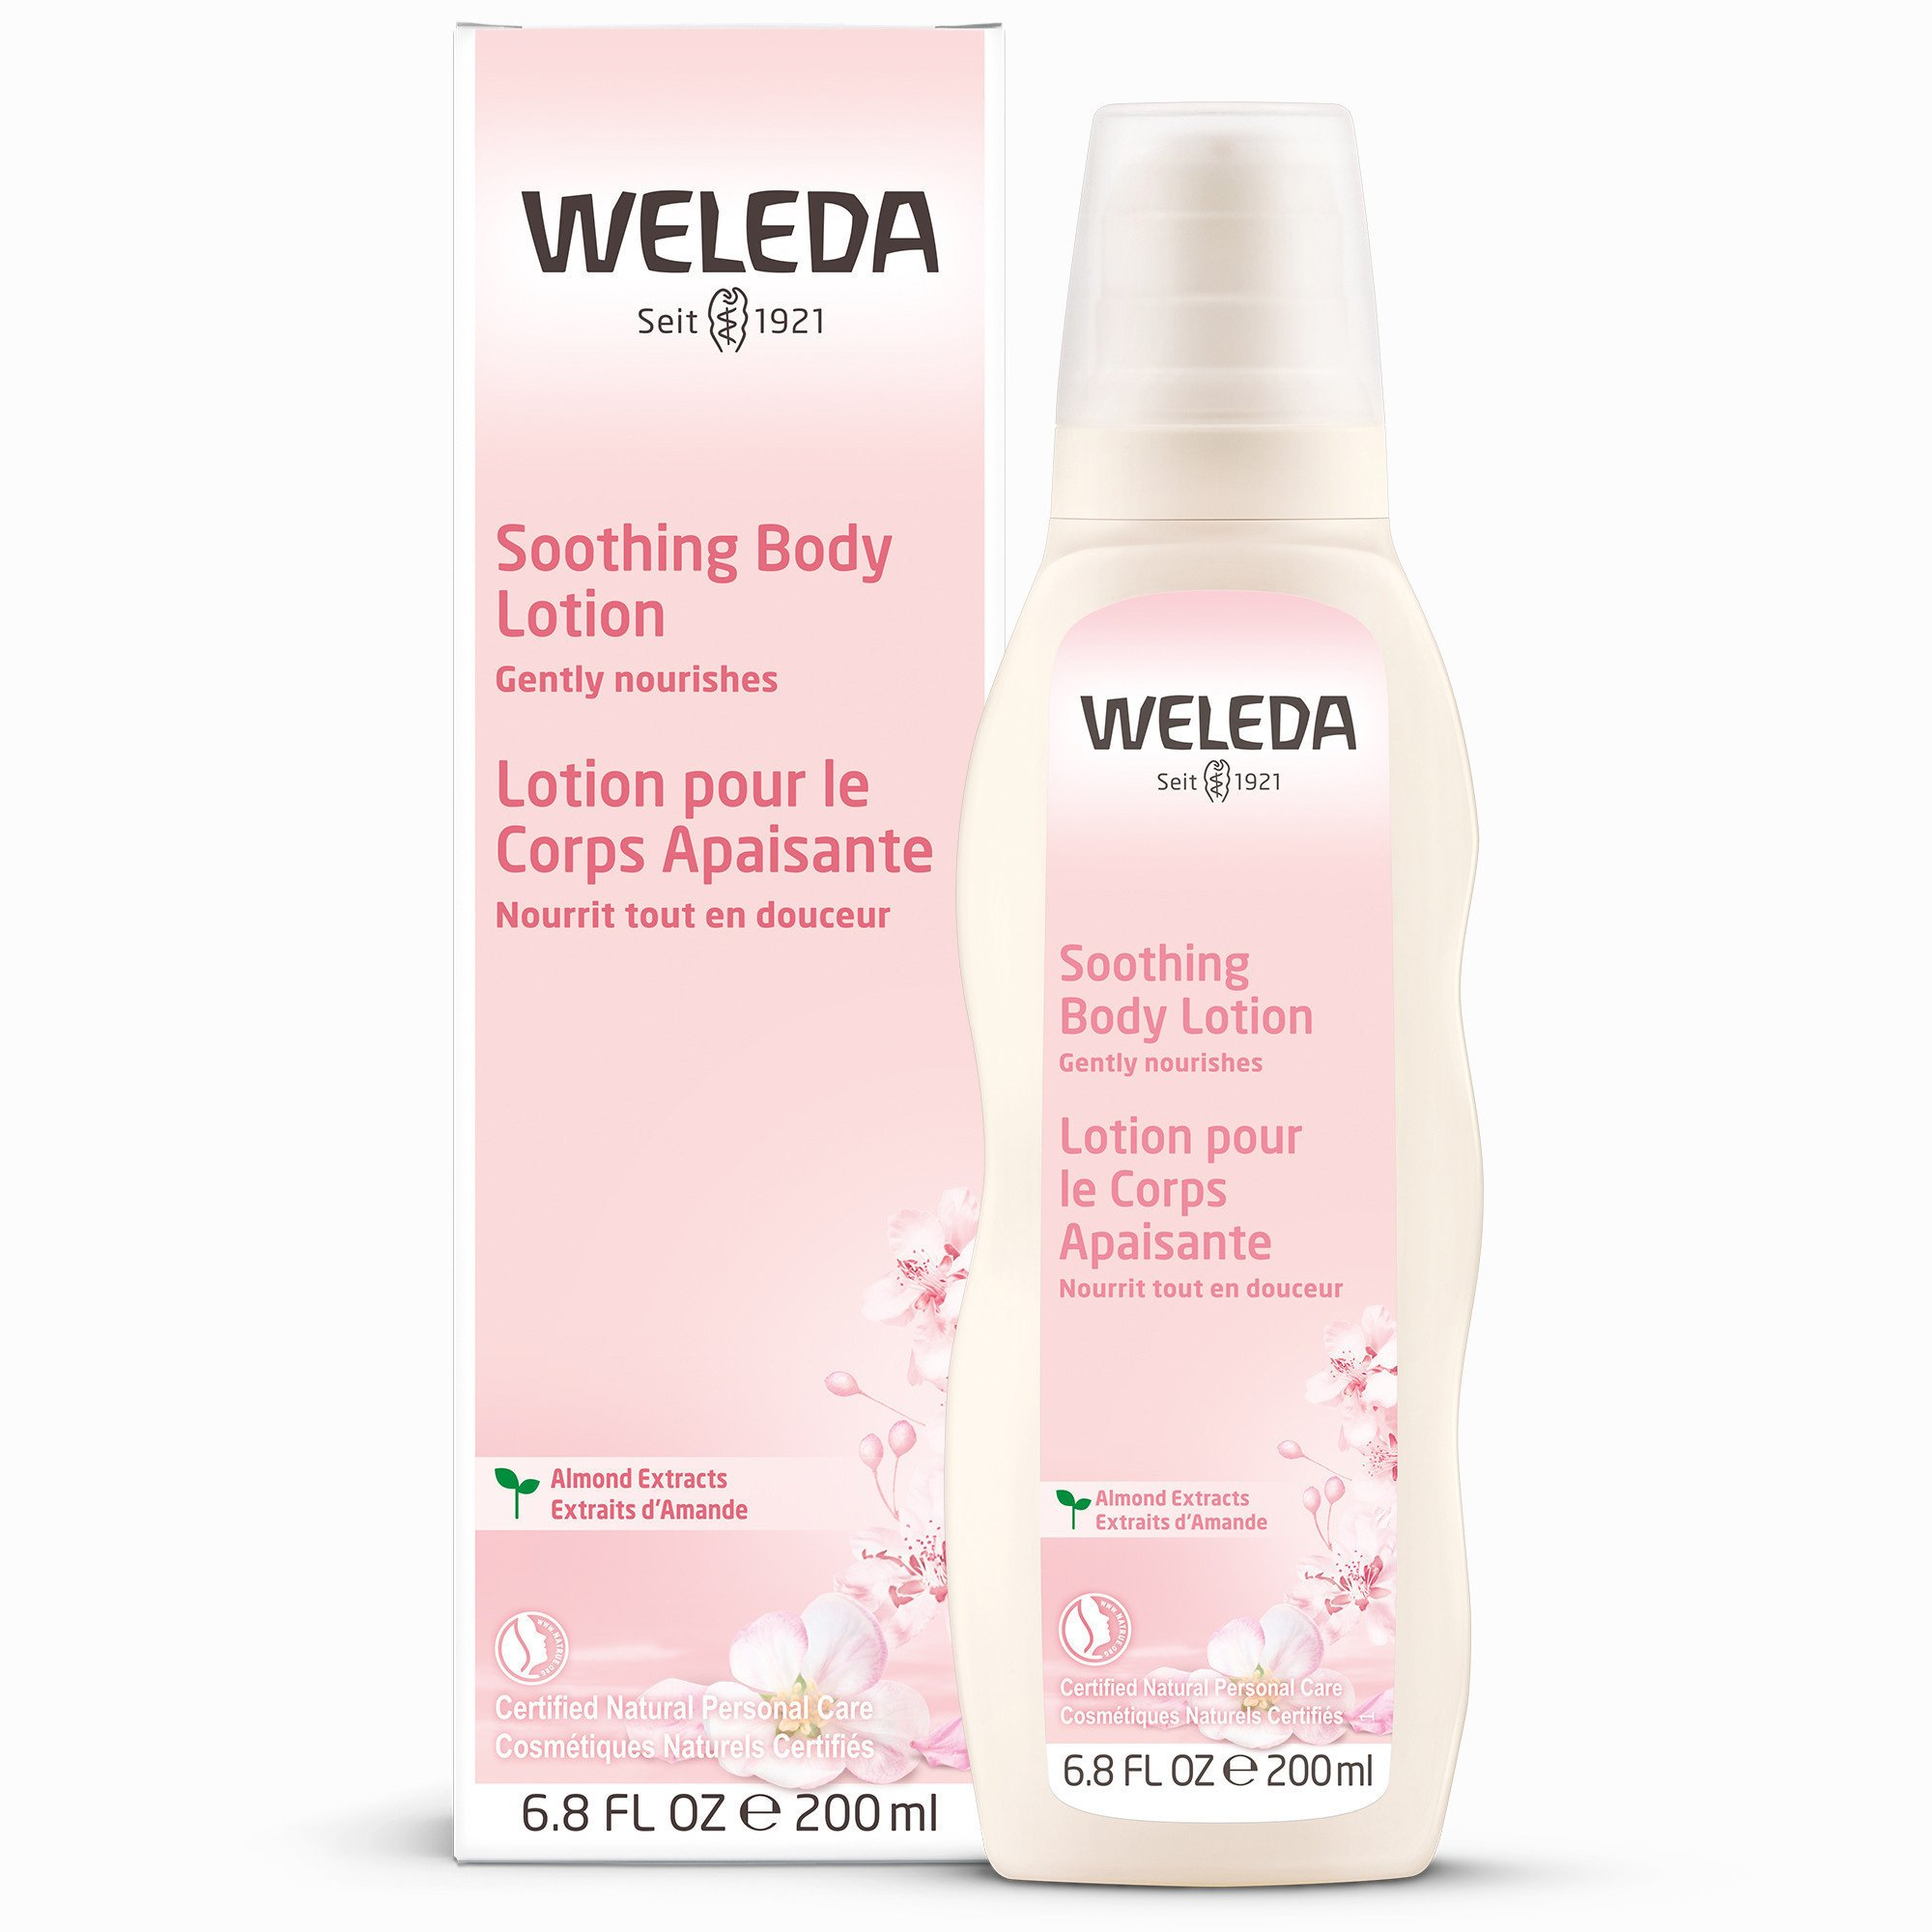 Weleda Almond Calming Body Lotion for Sensitive Skin Γαλάκτωμα Σώματος με Αμυγδαλέλαιο Ιδανικό για Ευαίσθητο Δέρμα 200ml